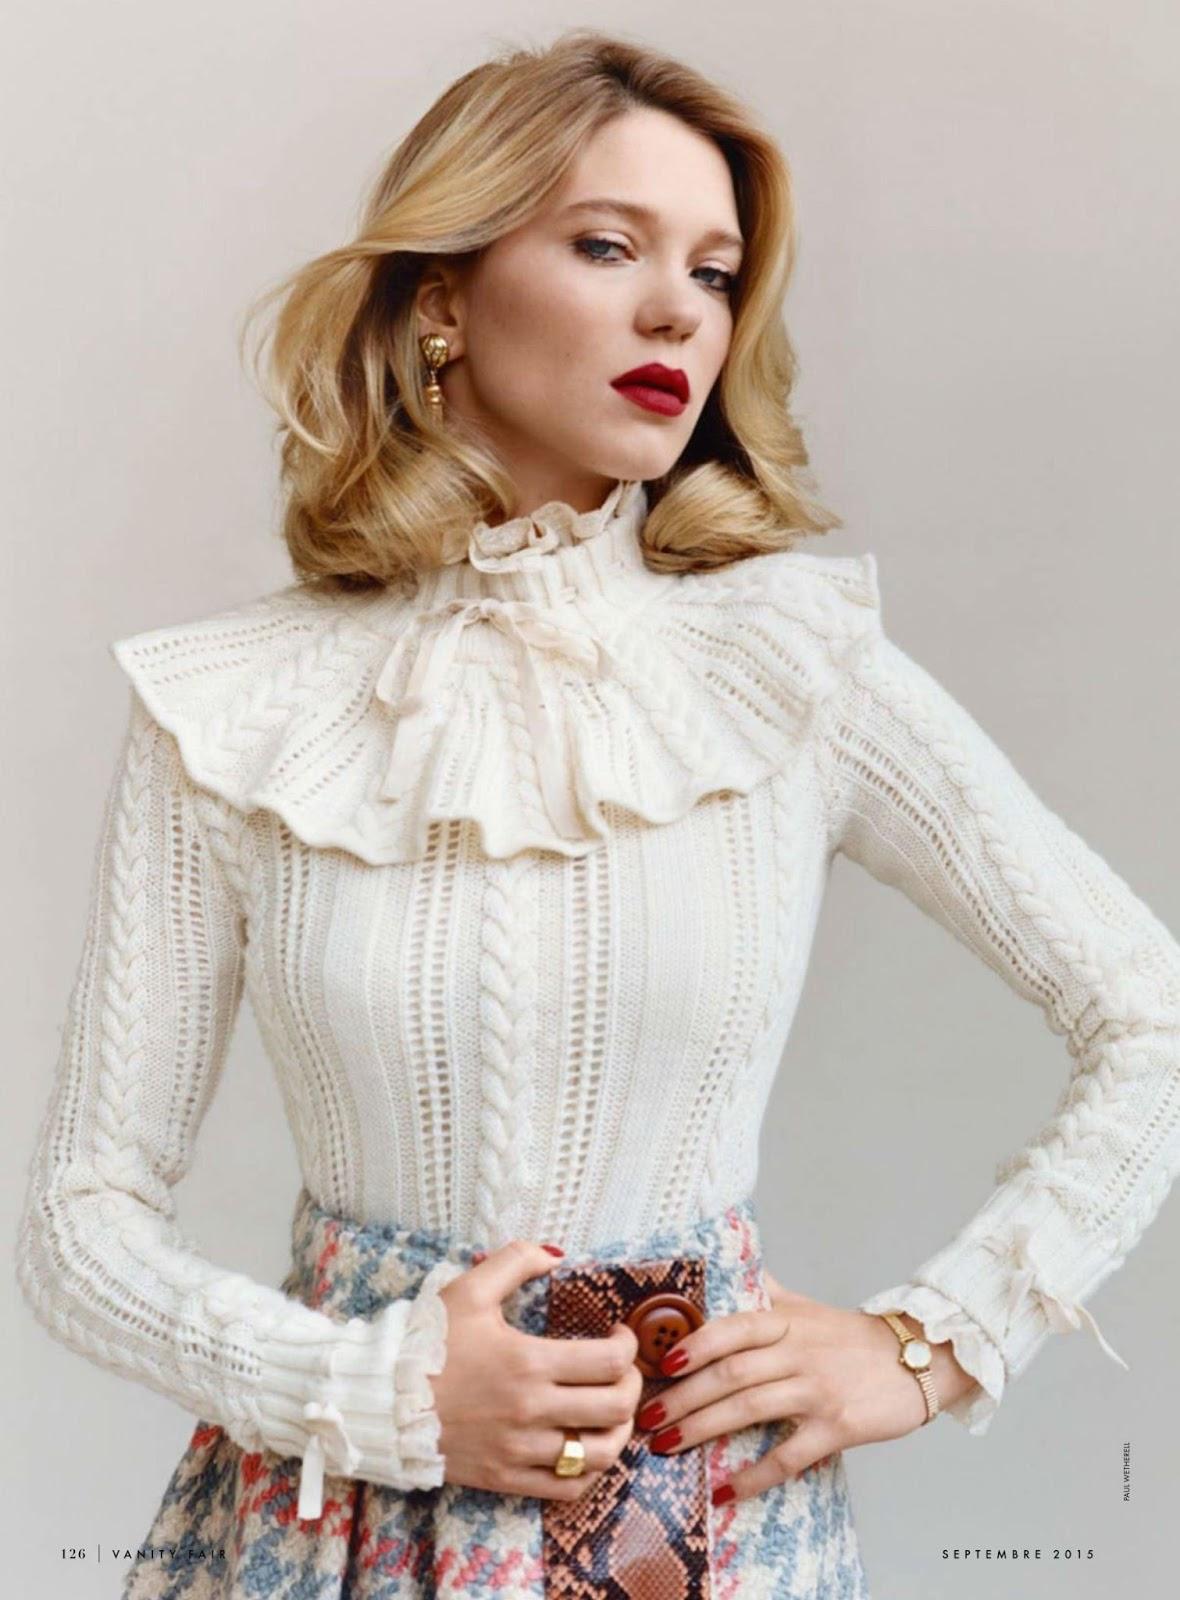 Lea Seydoux In Elle Magazine France February 2014 Issue: Duchess Dior: Lea Seydoux By Paul Wetherell For Vanity